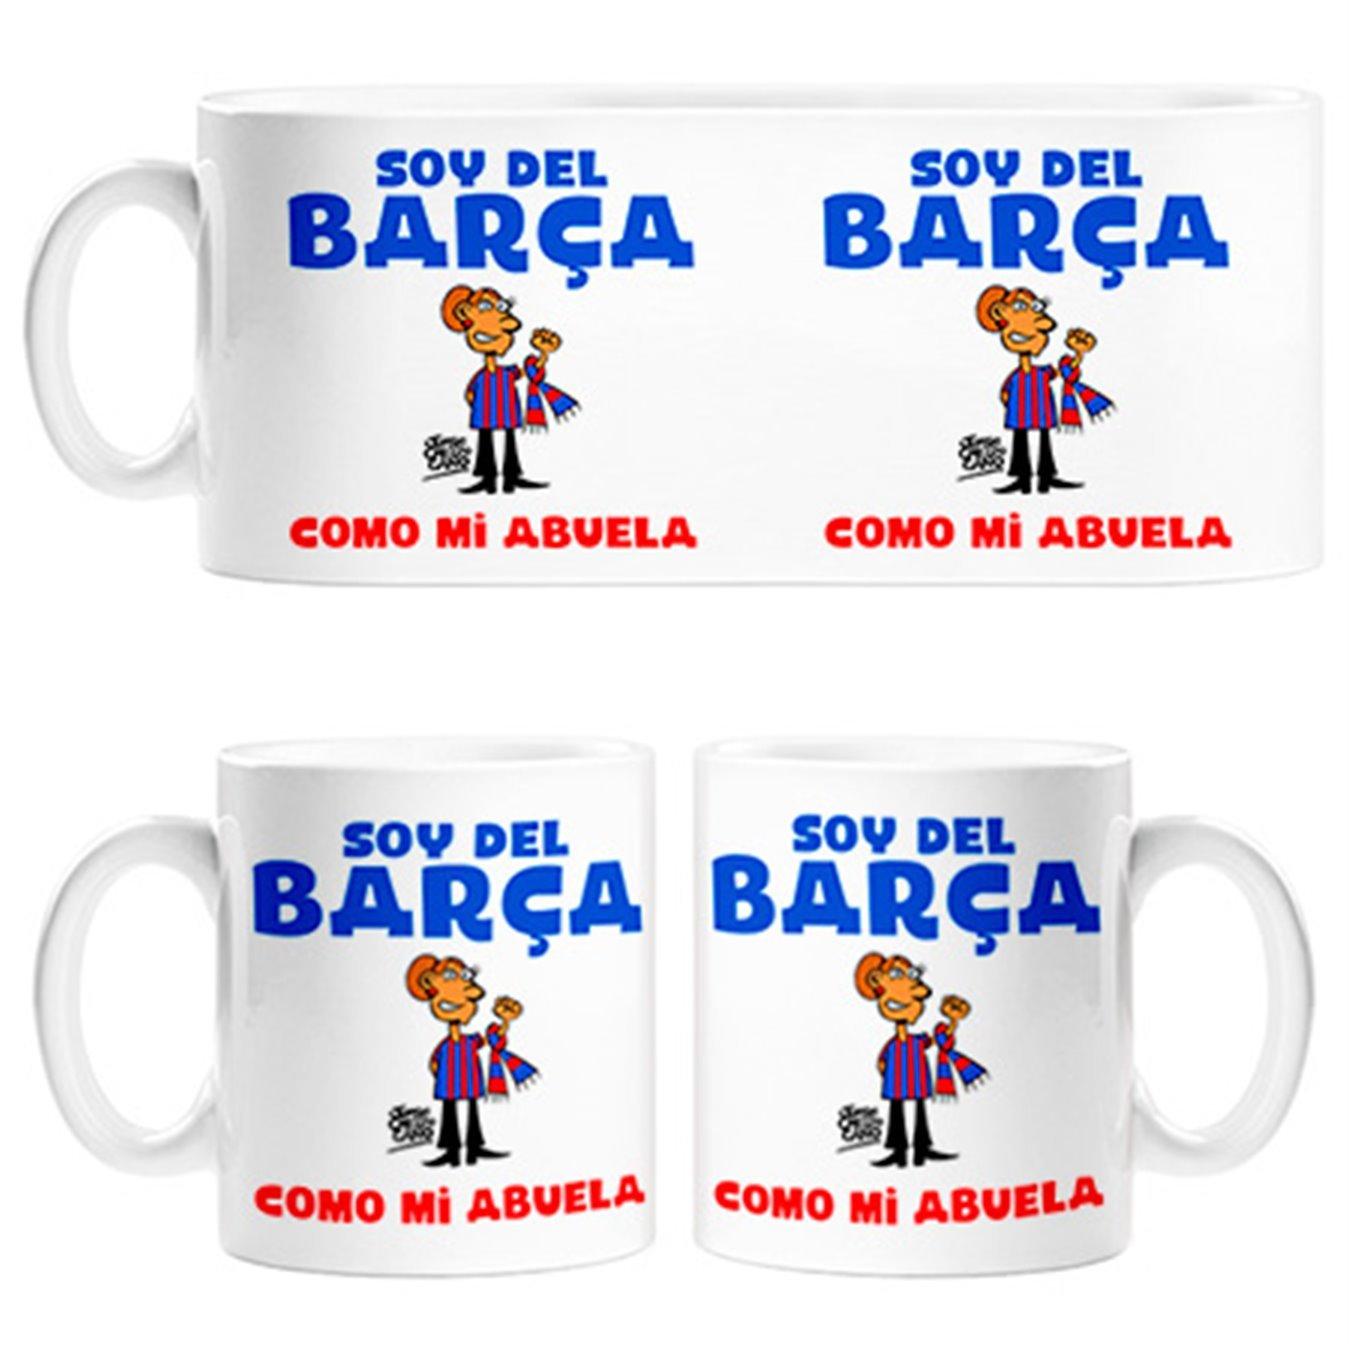 Taza soy del Barça como mi abuela Jorge Crespo Cano - Cerámica: Amazon.es: Hogar